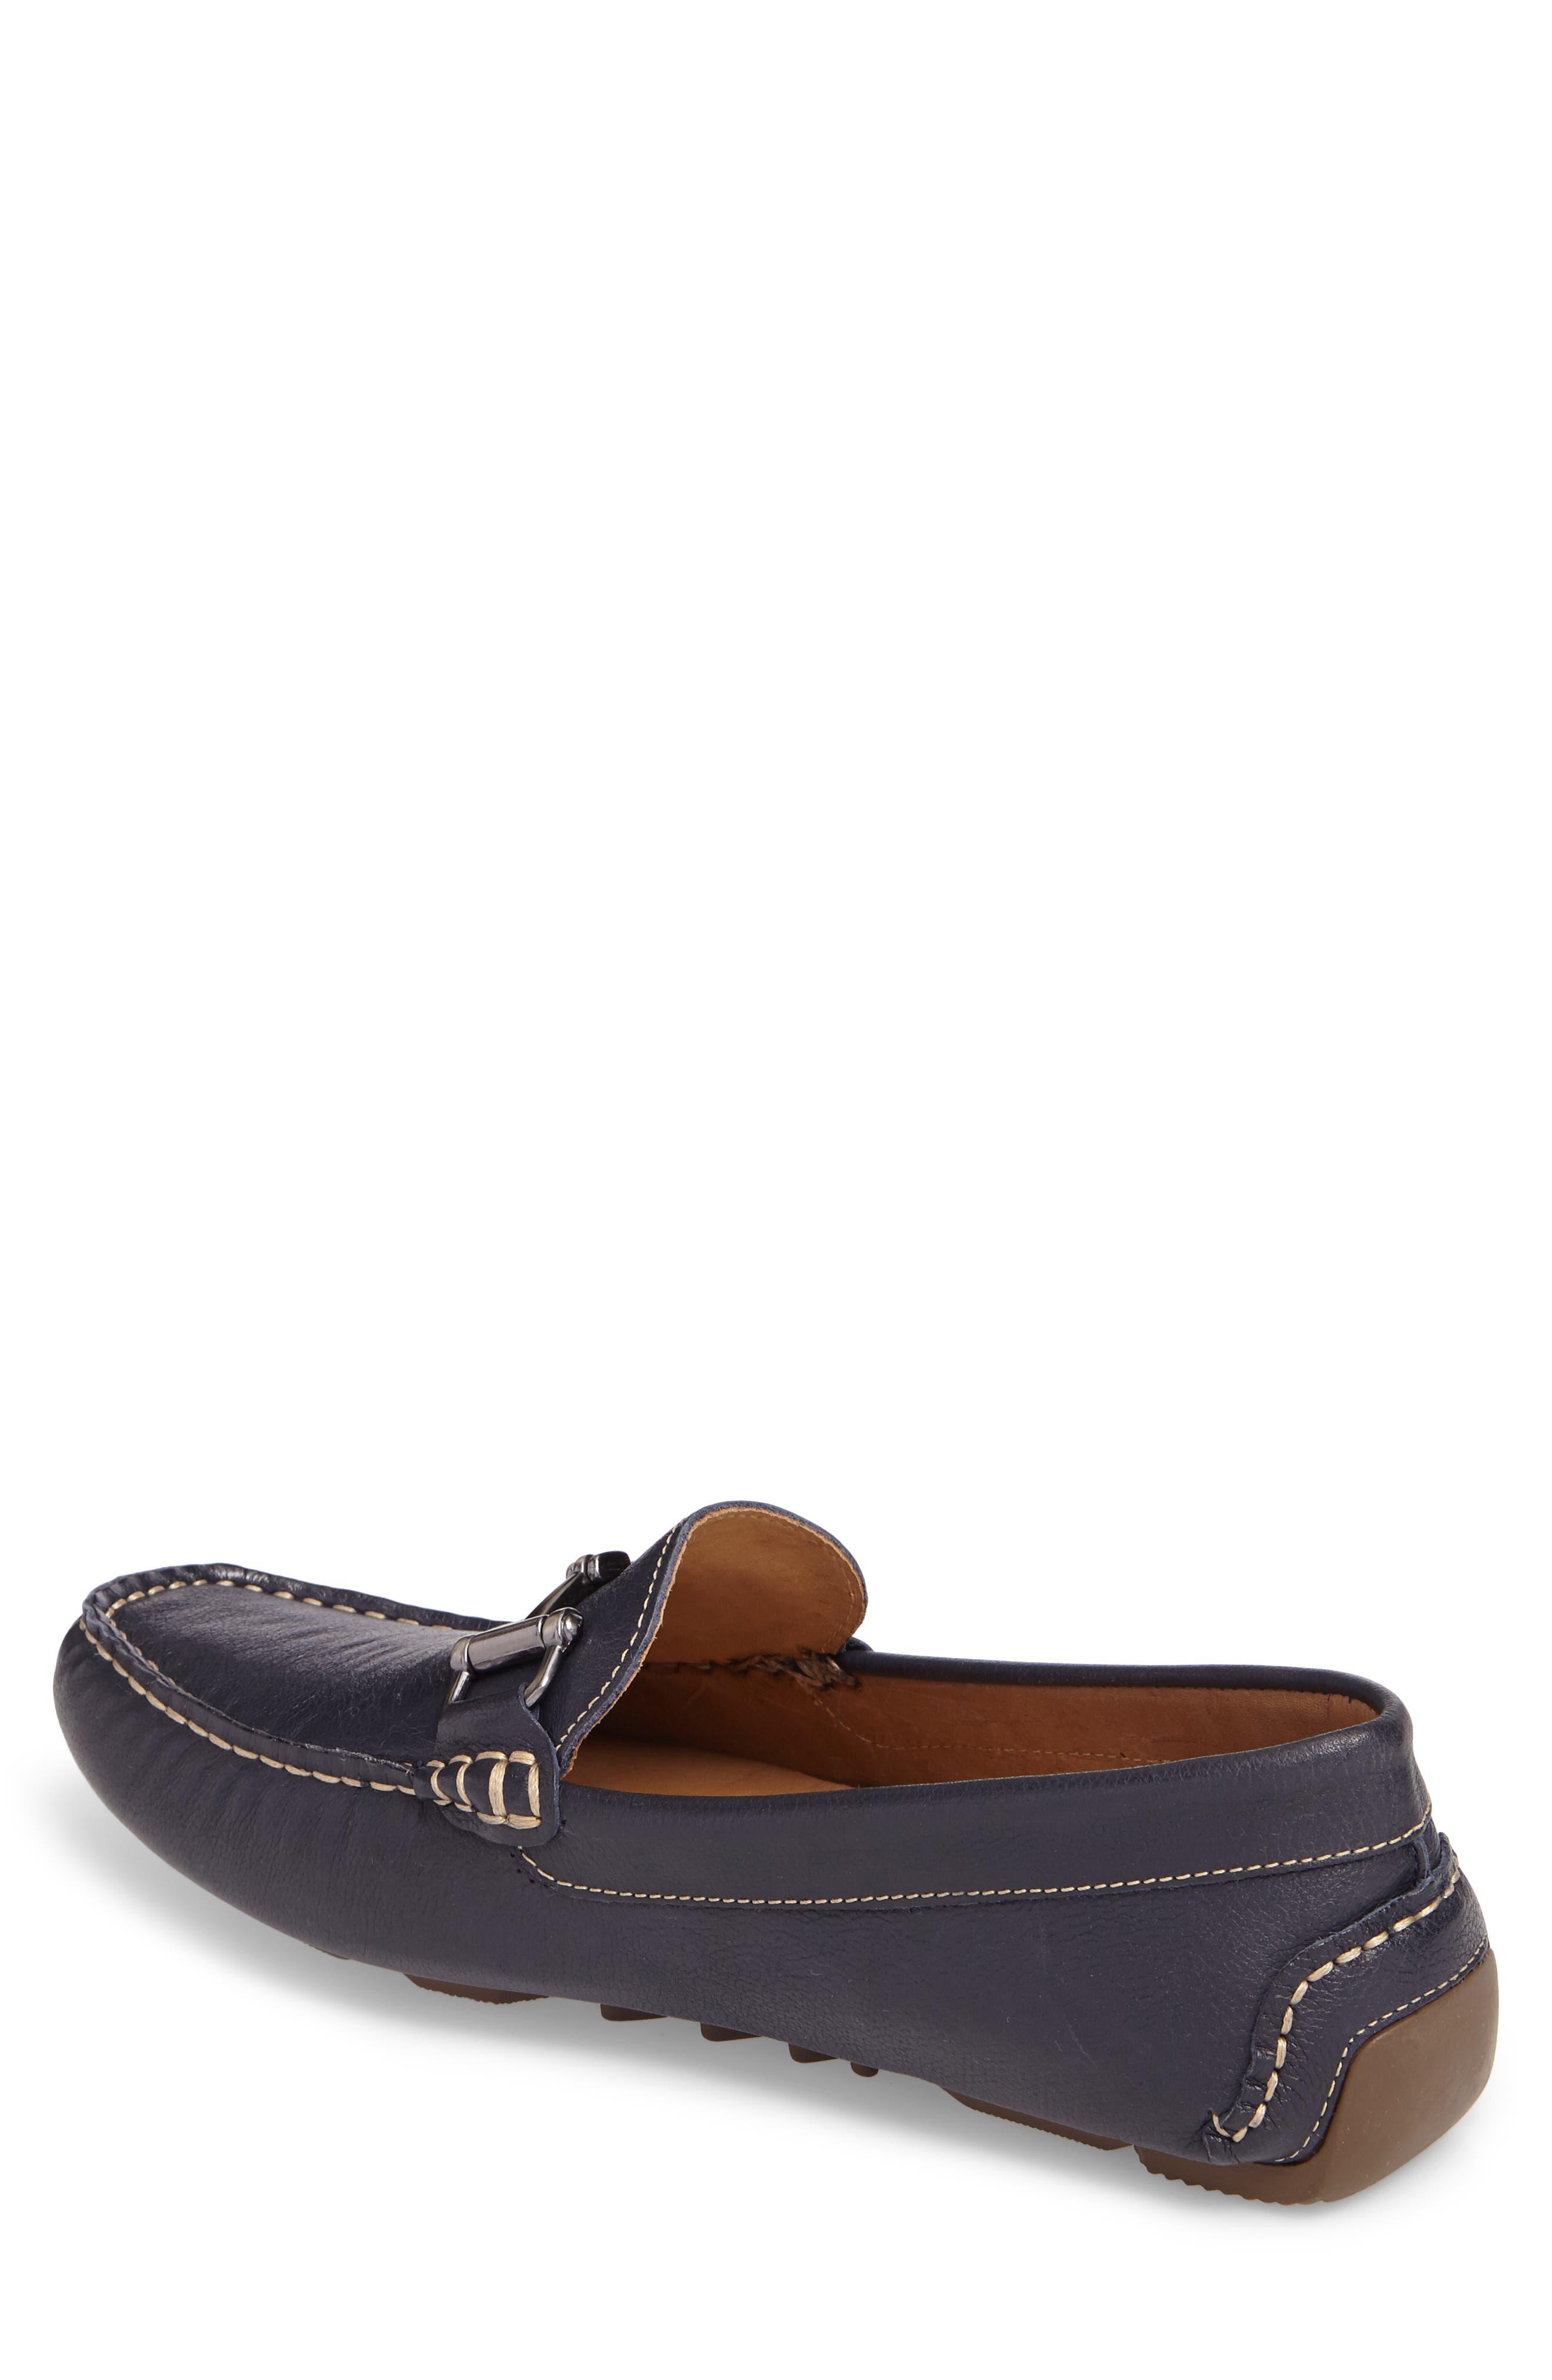 Topanga Driving Shoe,                             Alternate thumbnail 2, color,                             Navy Leather